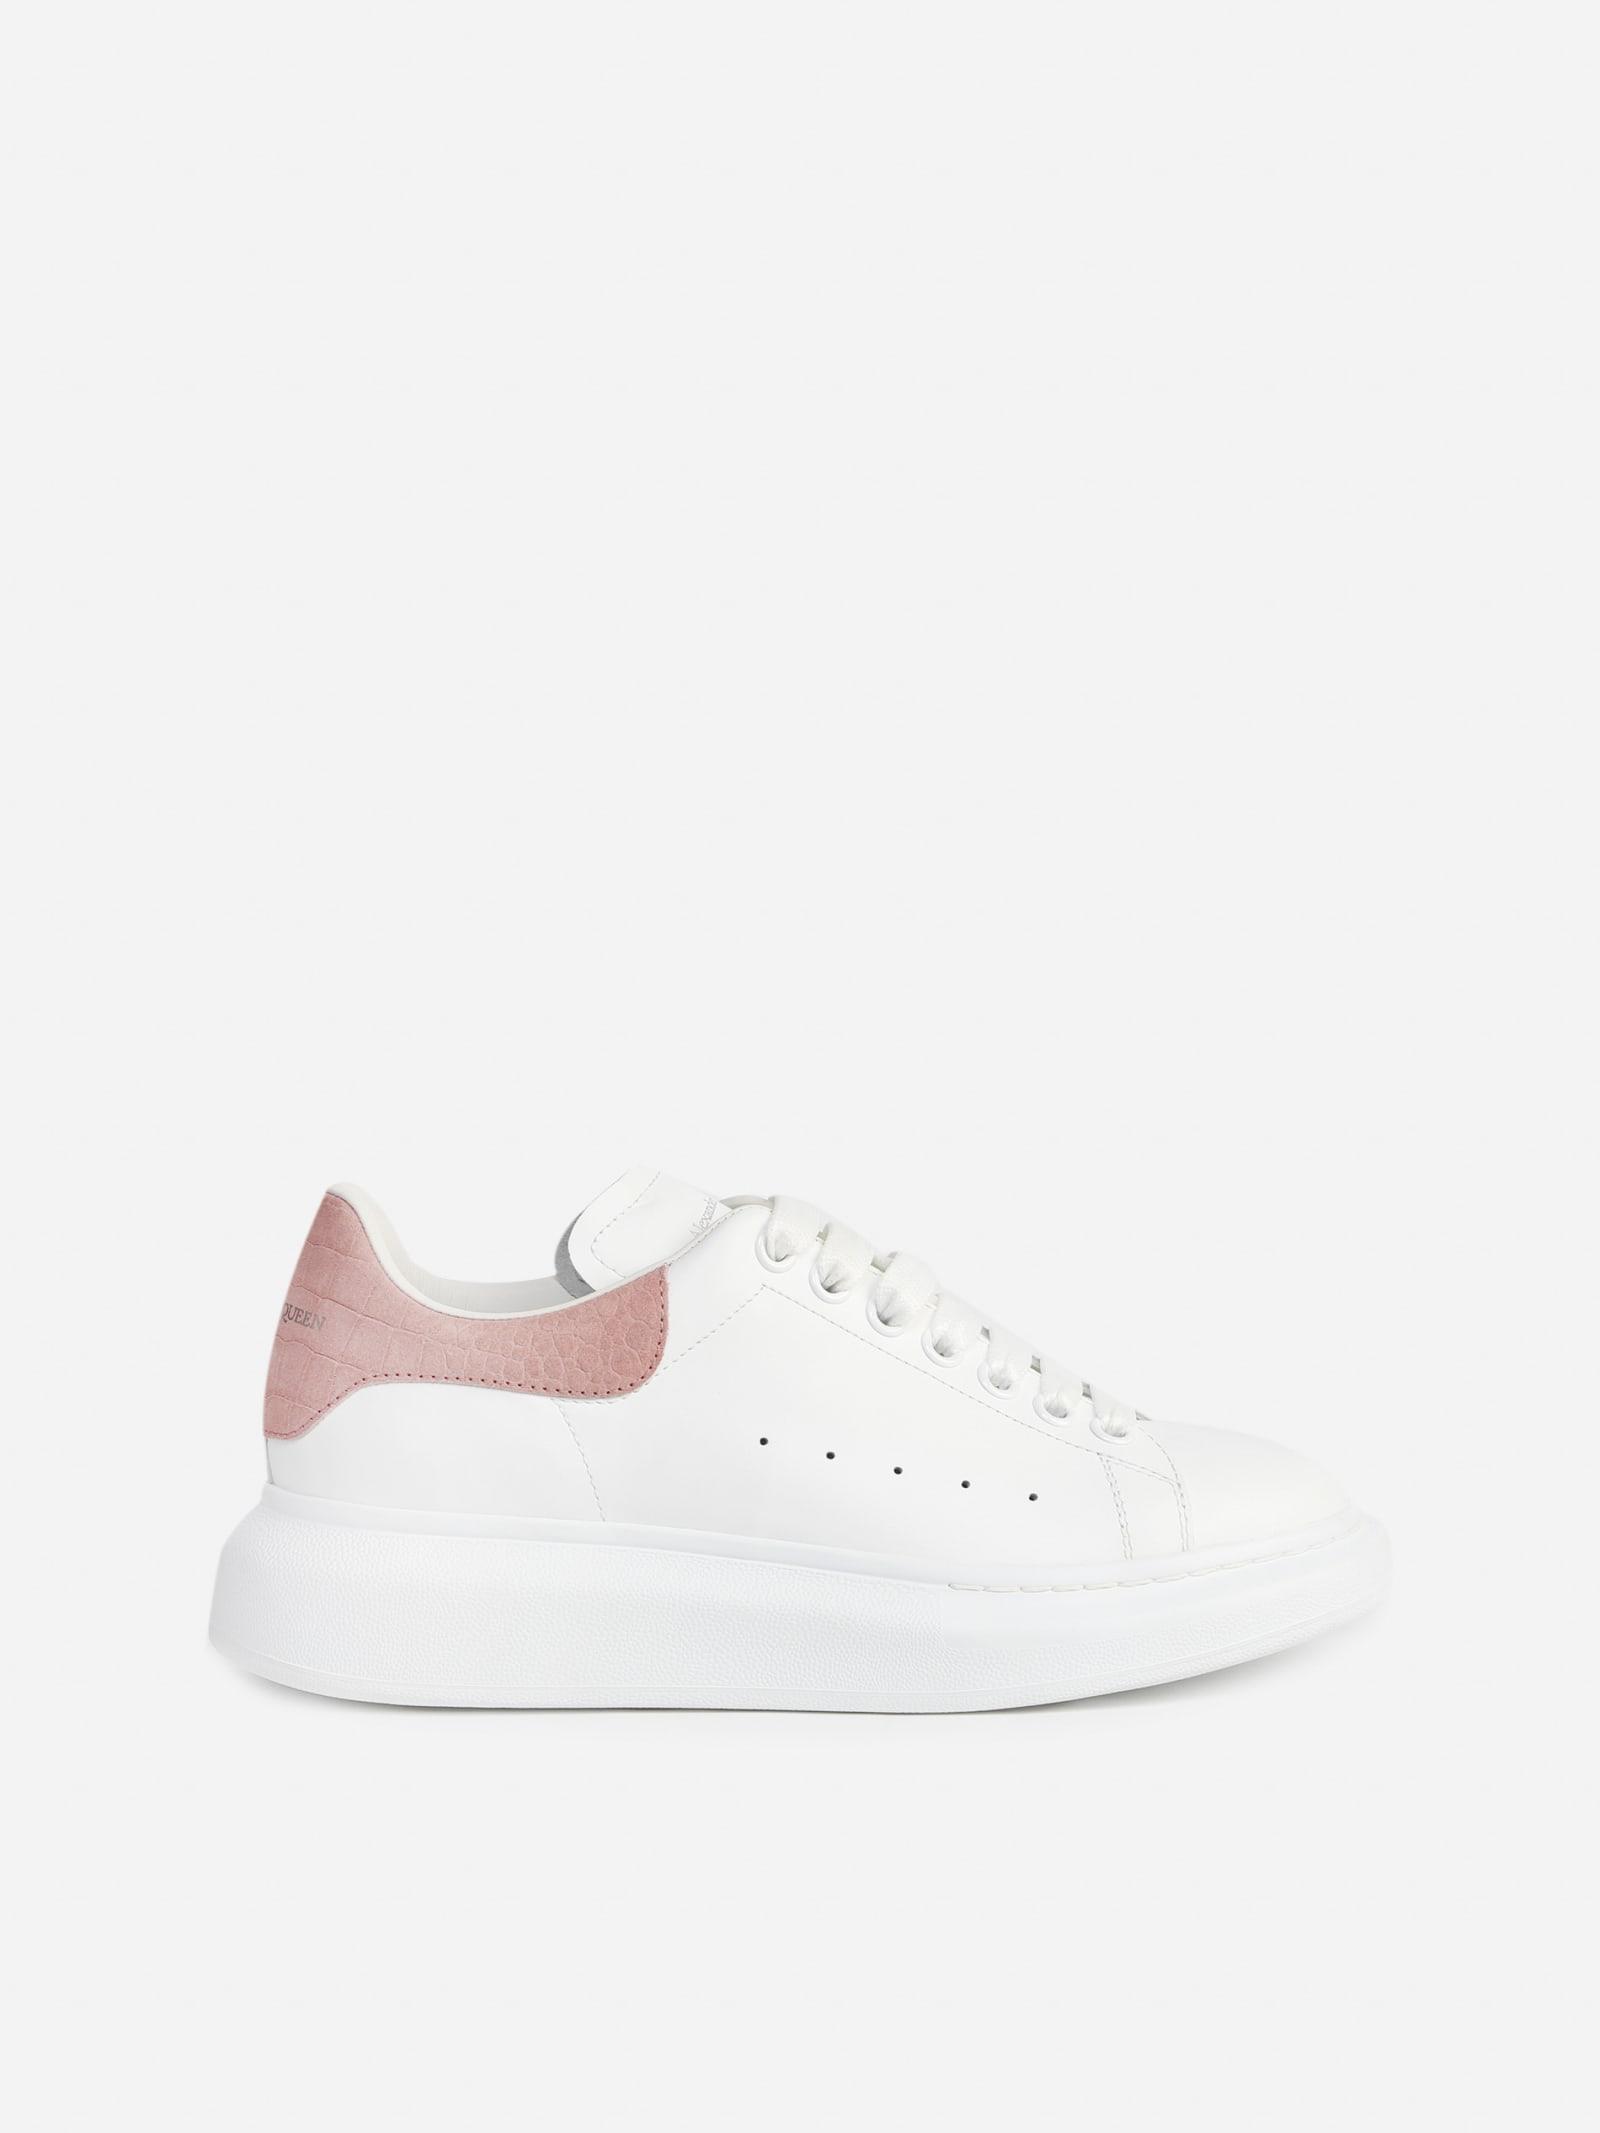 Alexander McQueen Oversize Sneakers In Leather With Contrasting Heel Tab